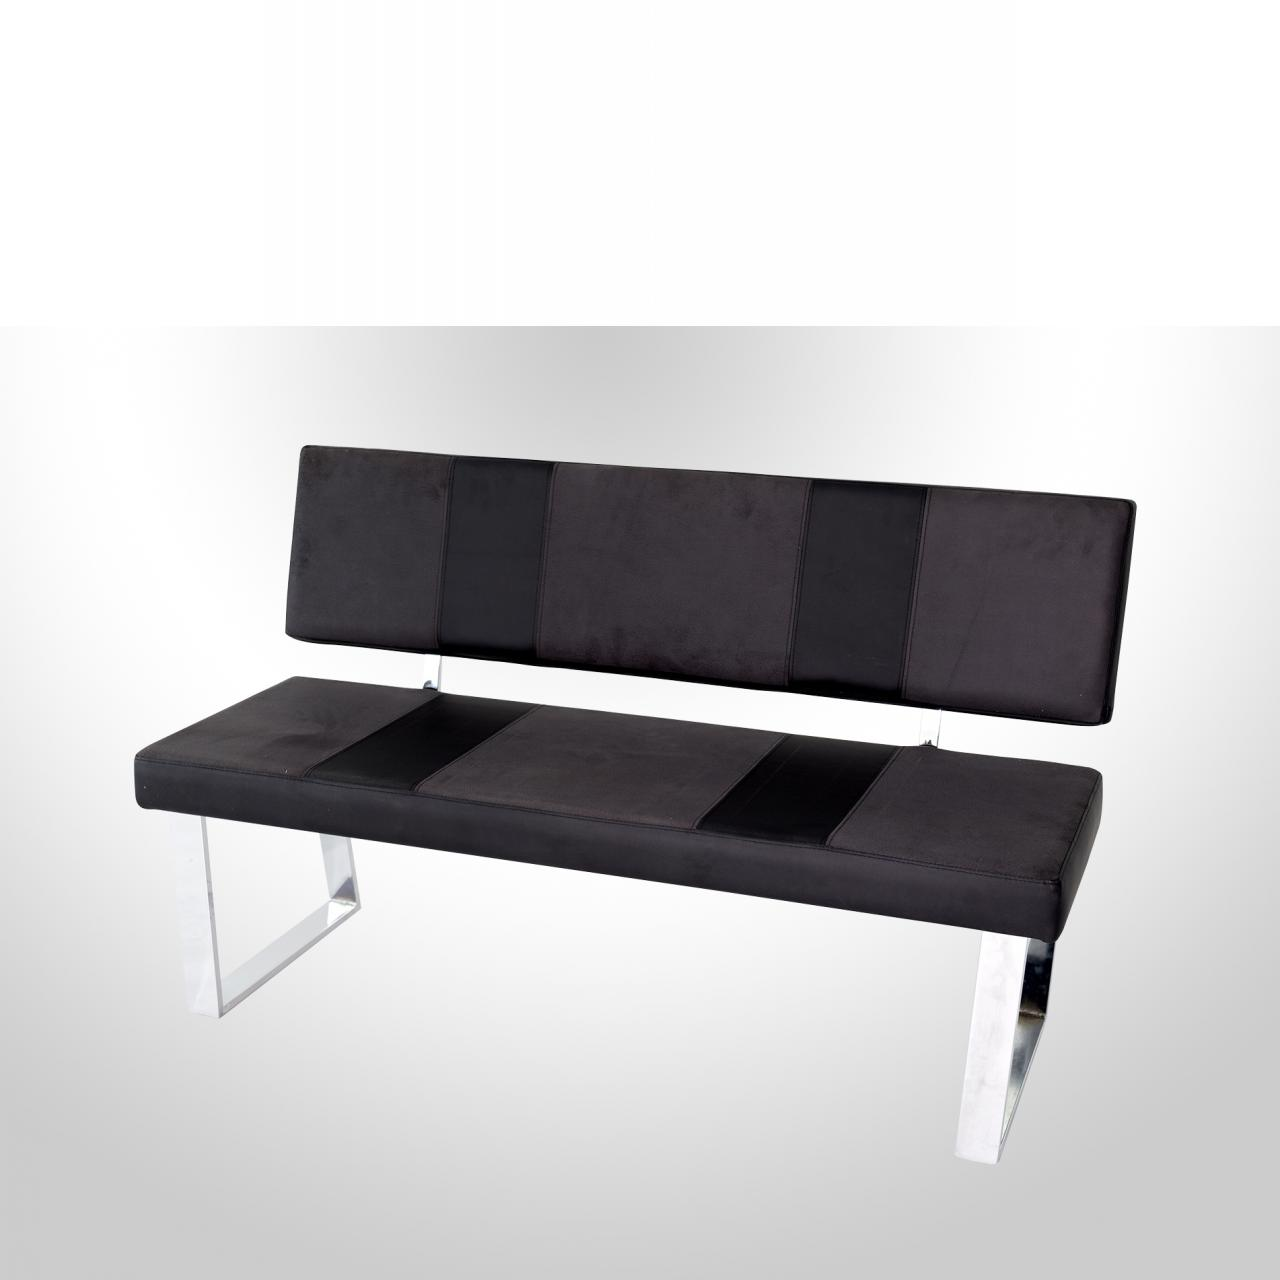 Sitzbank Santa Bari R5122-02